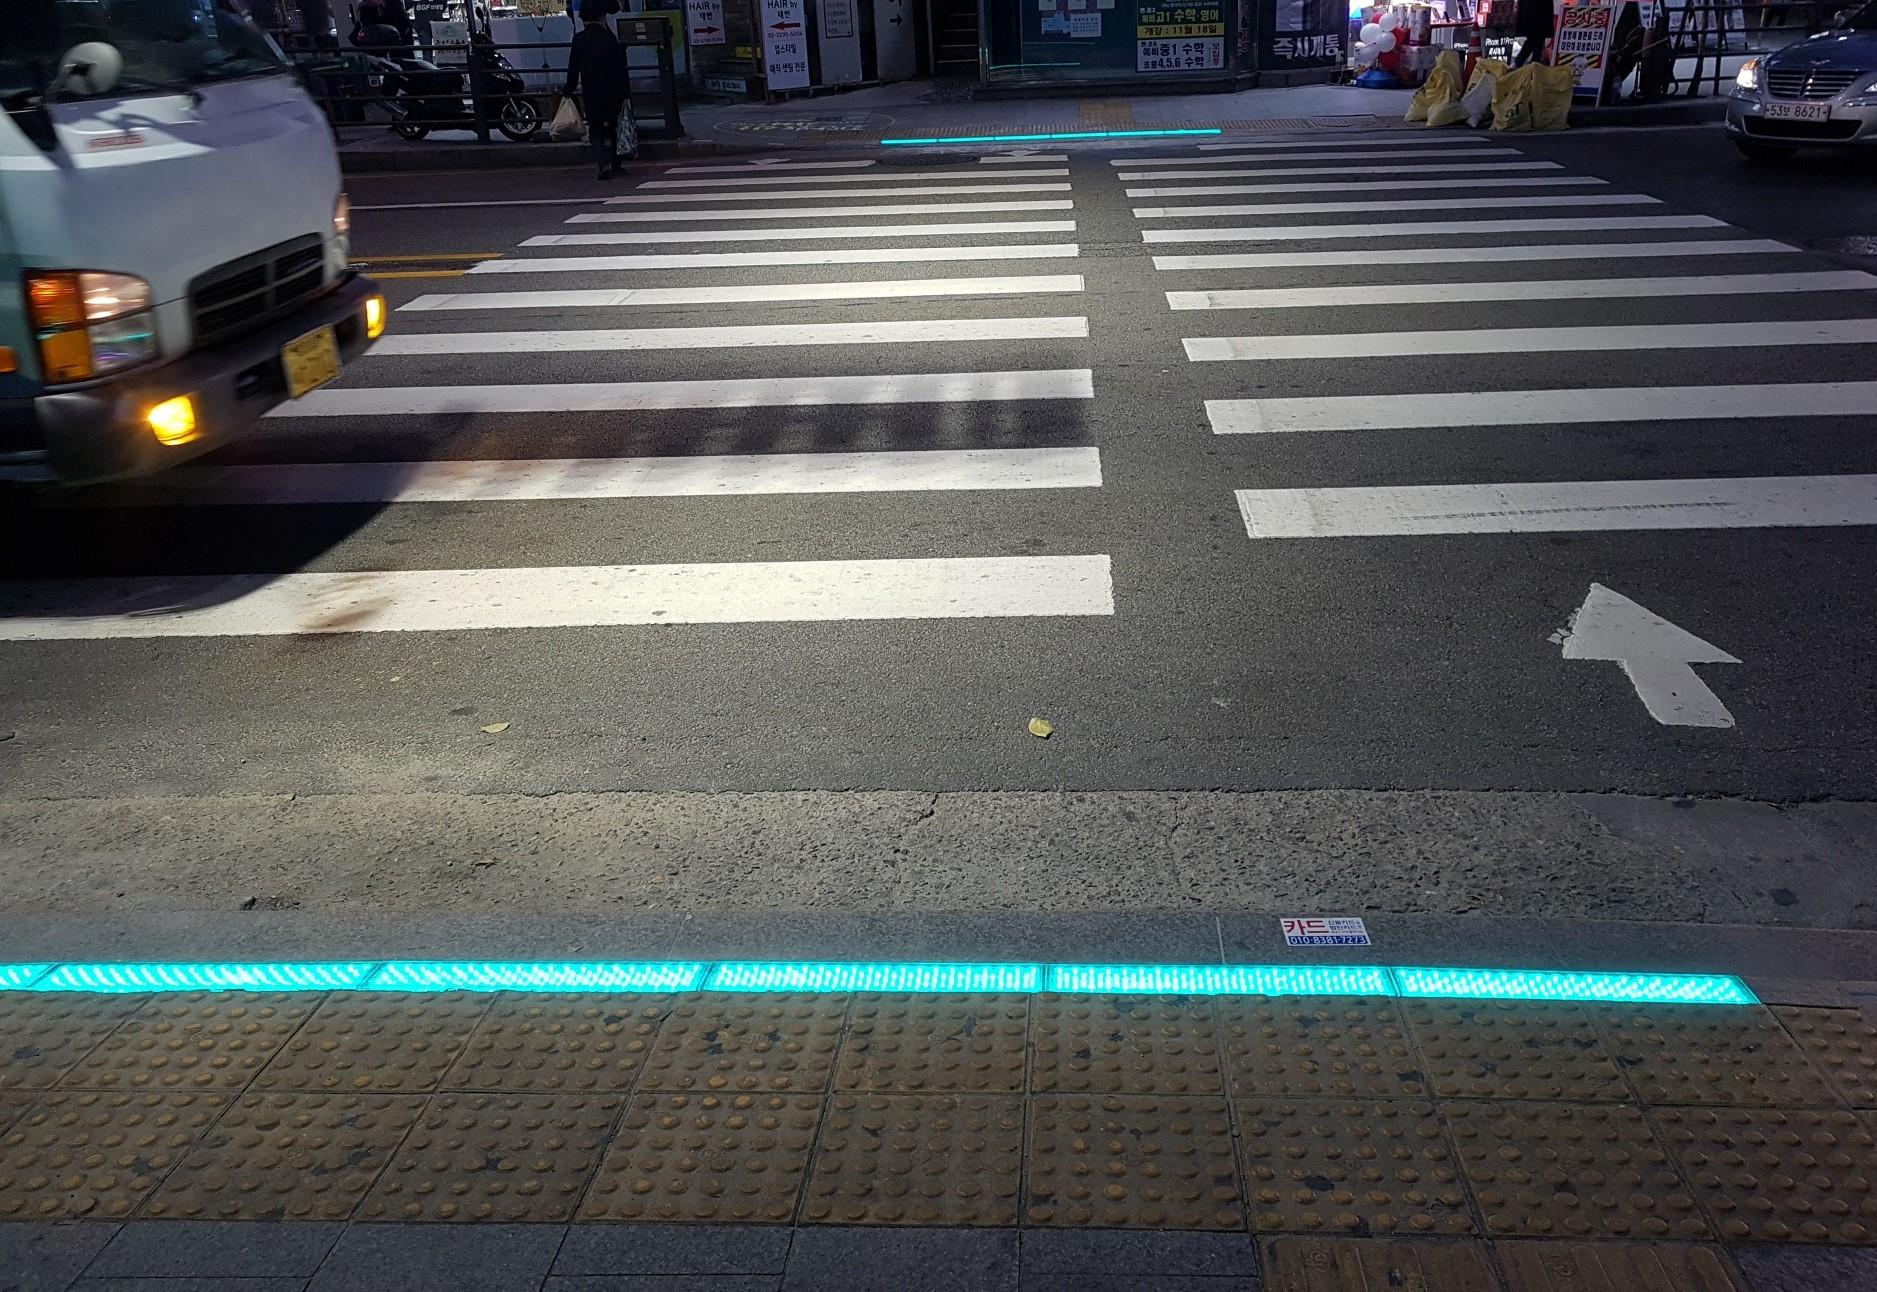 〔ANN의 뉴스 포커스〕 바닥 신호등이 스몸비 교통사고 막는다